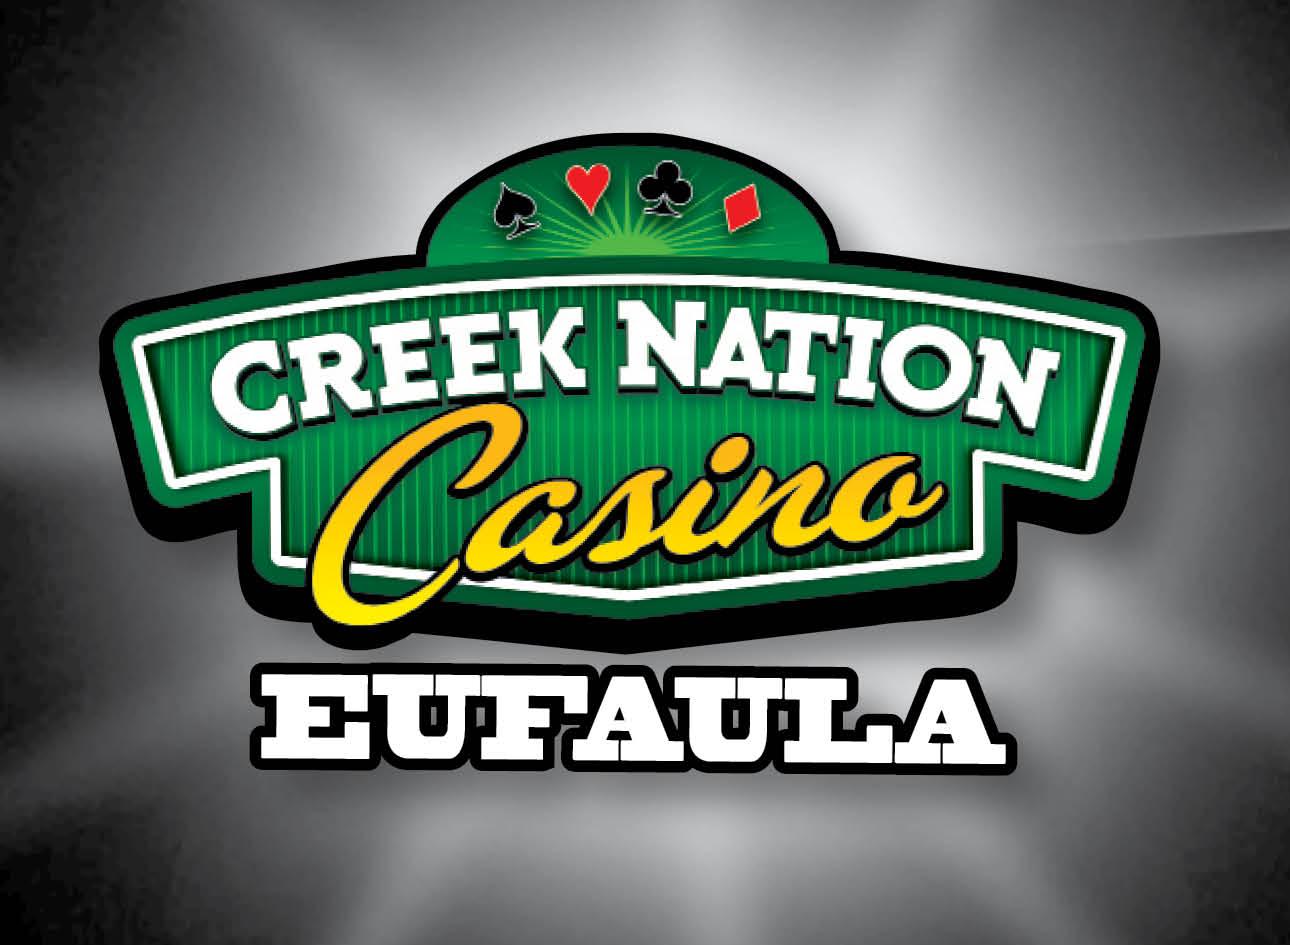 Creek Nation Casino of Eufaula